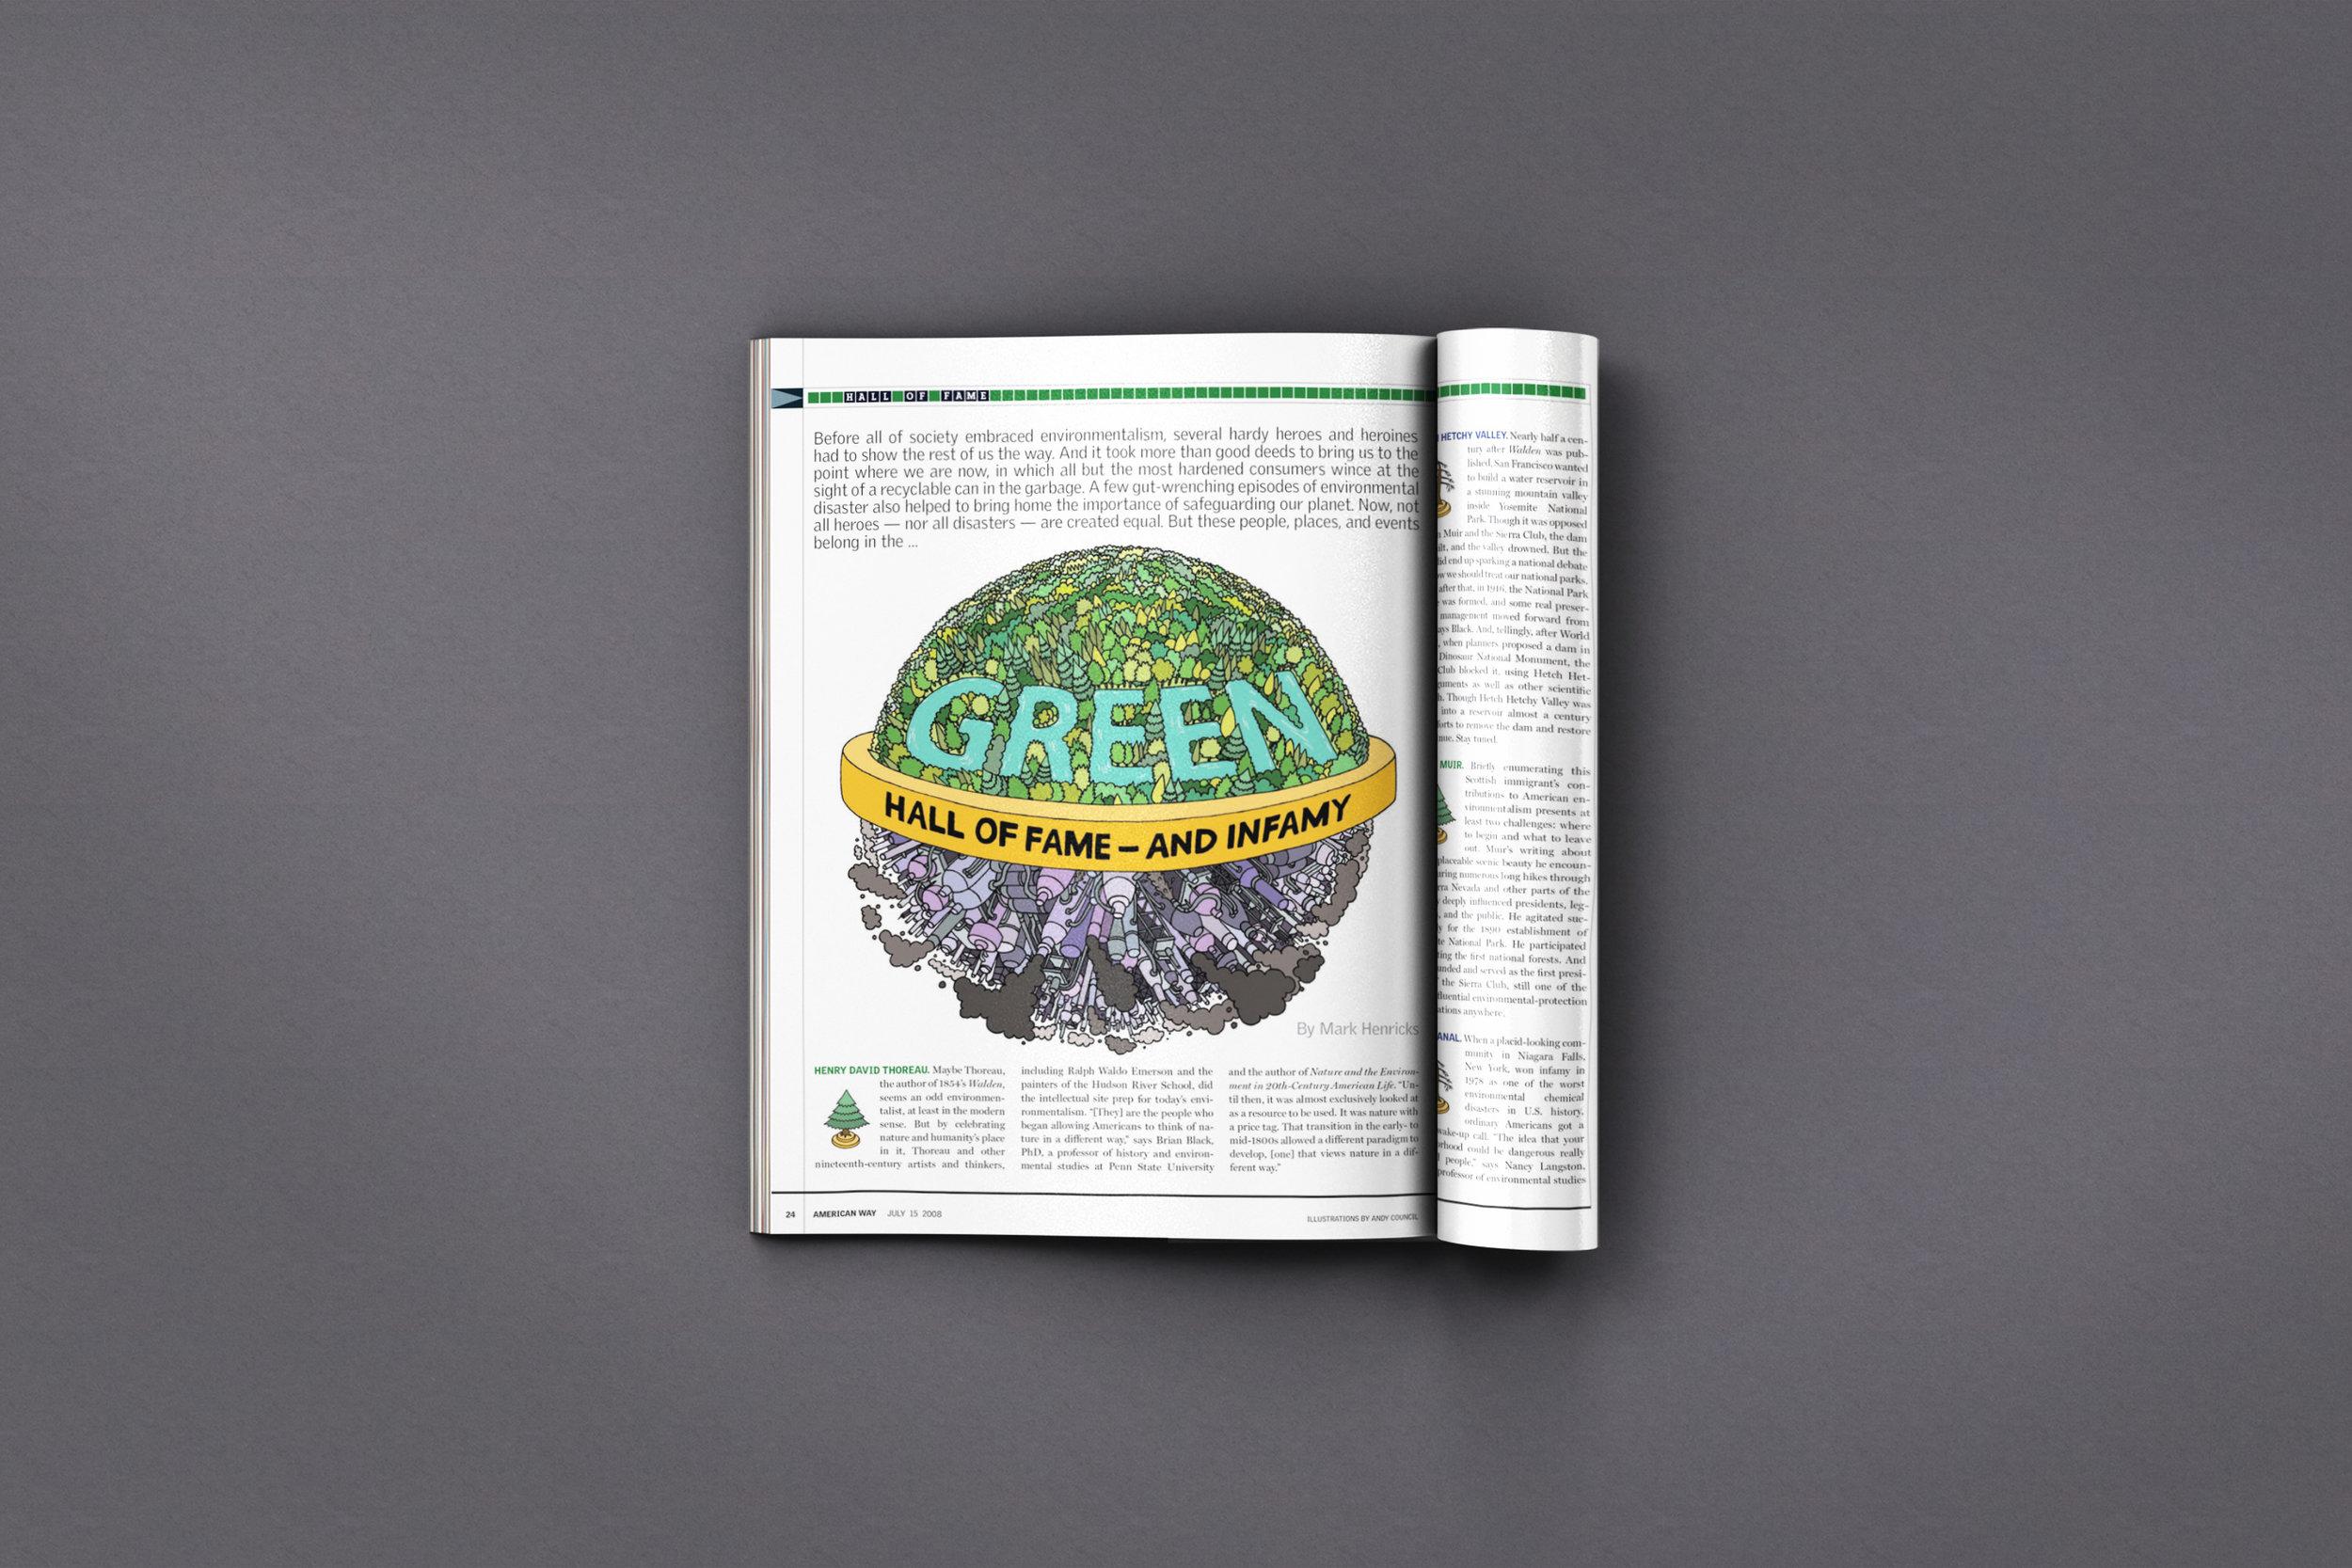 ronaldvillegas-illustration-americanway-greenhalloffame-story.jpg